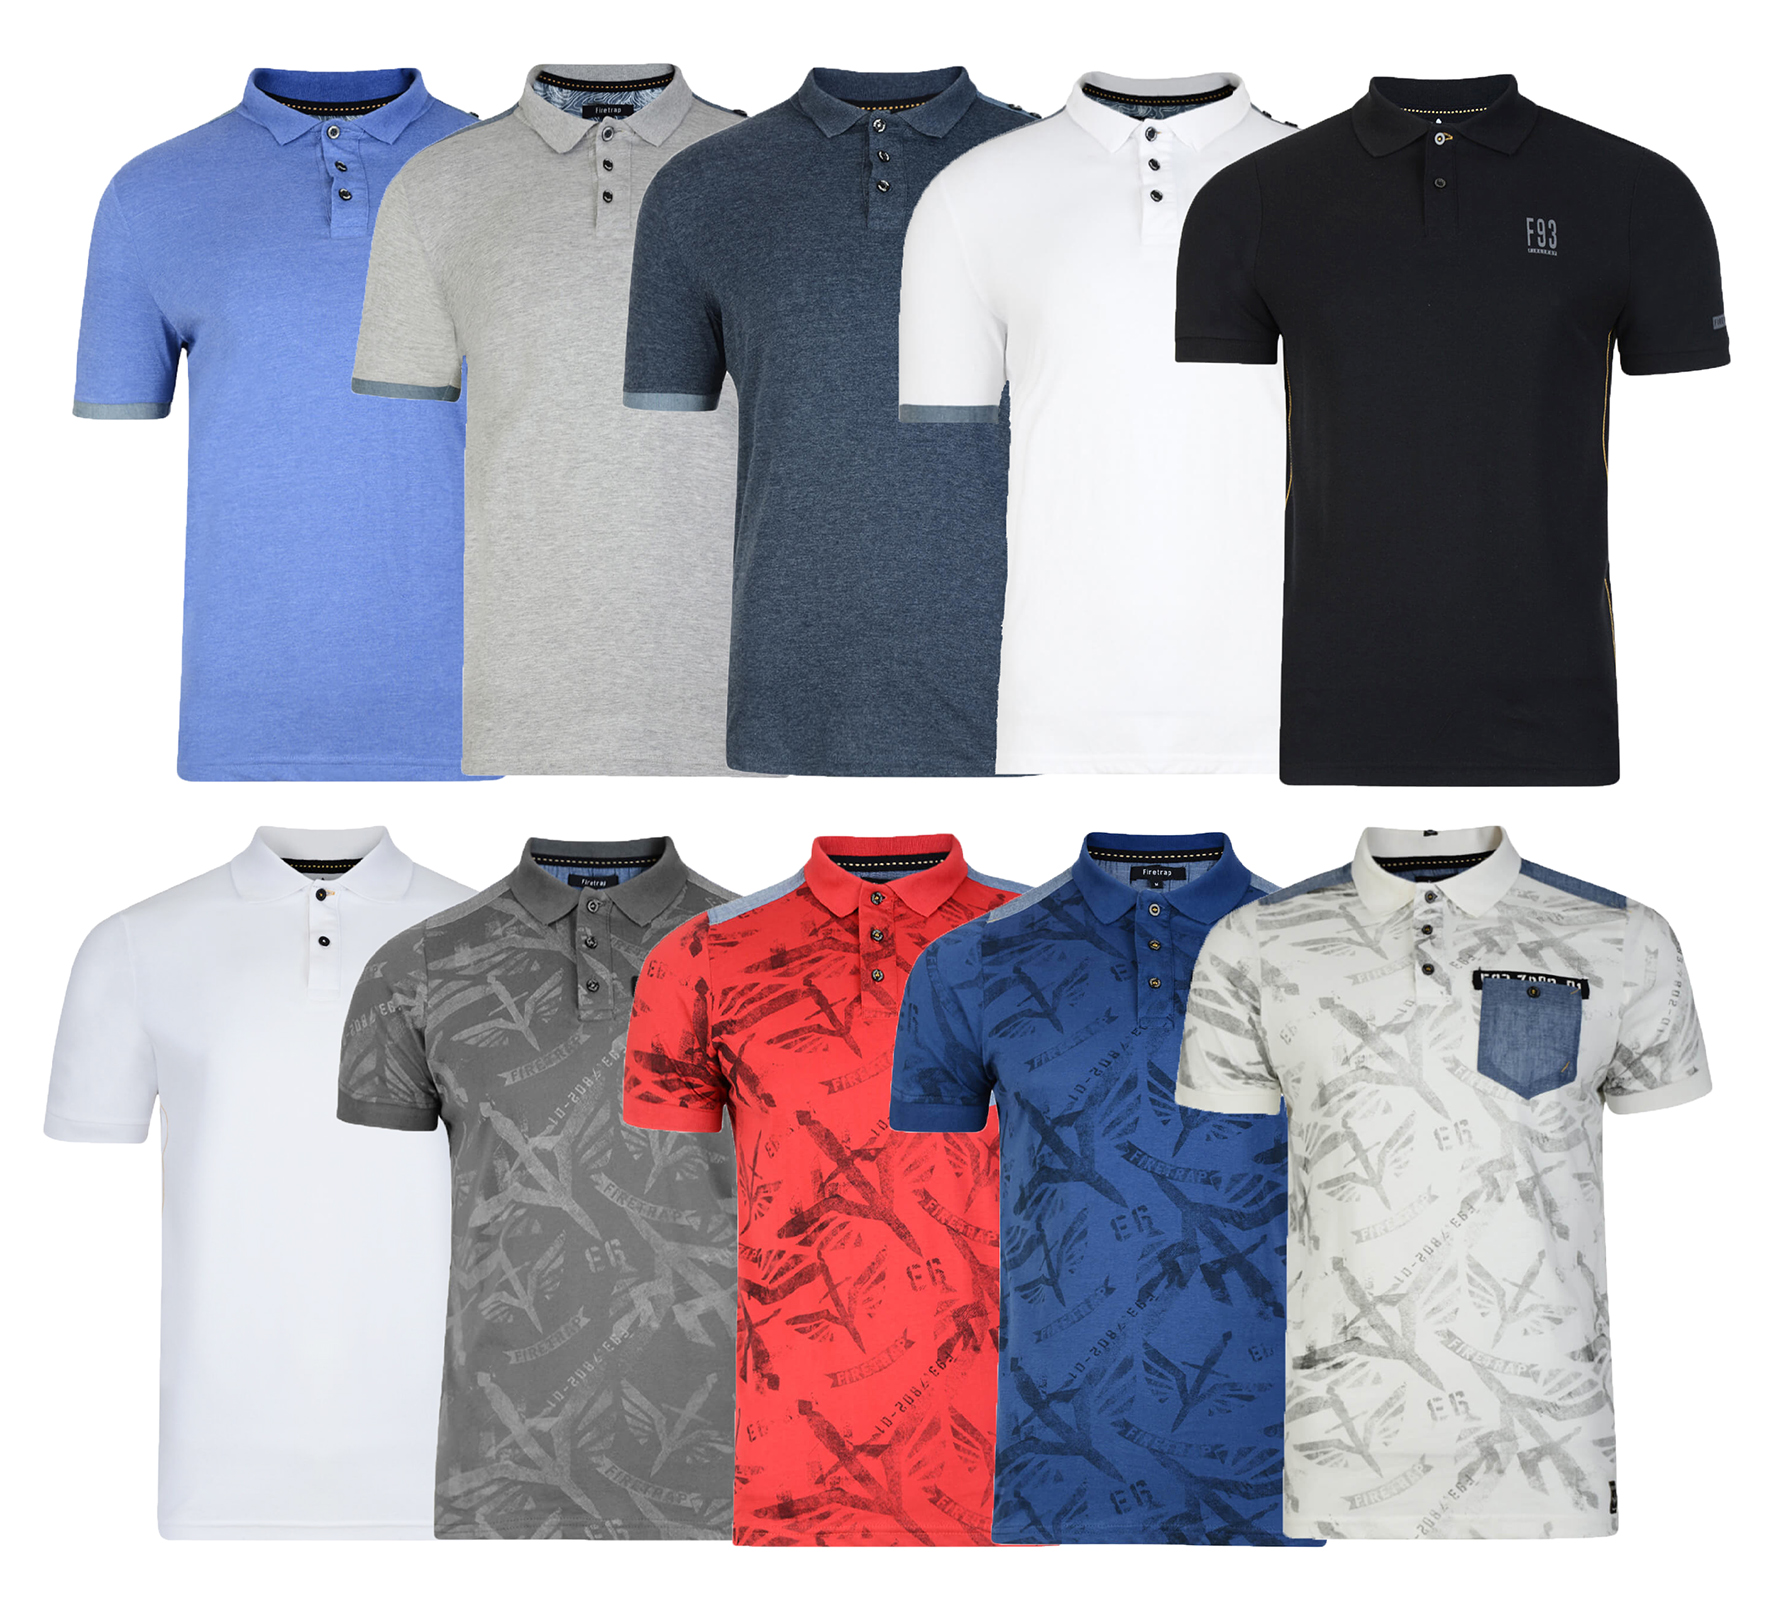 Firetrap Polo Shirt Soft Sizes Plain Navy XL Mens Medium